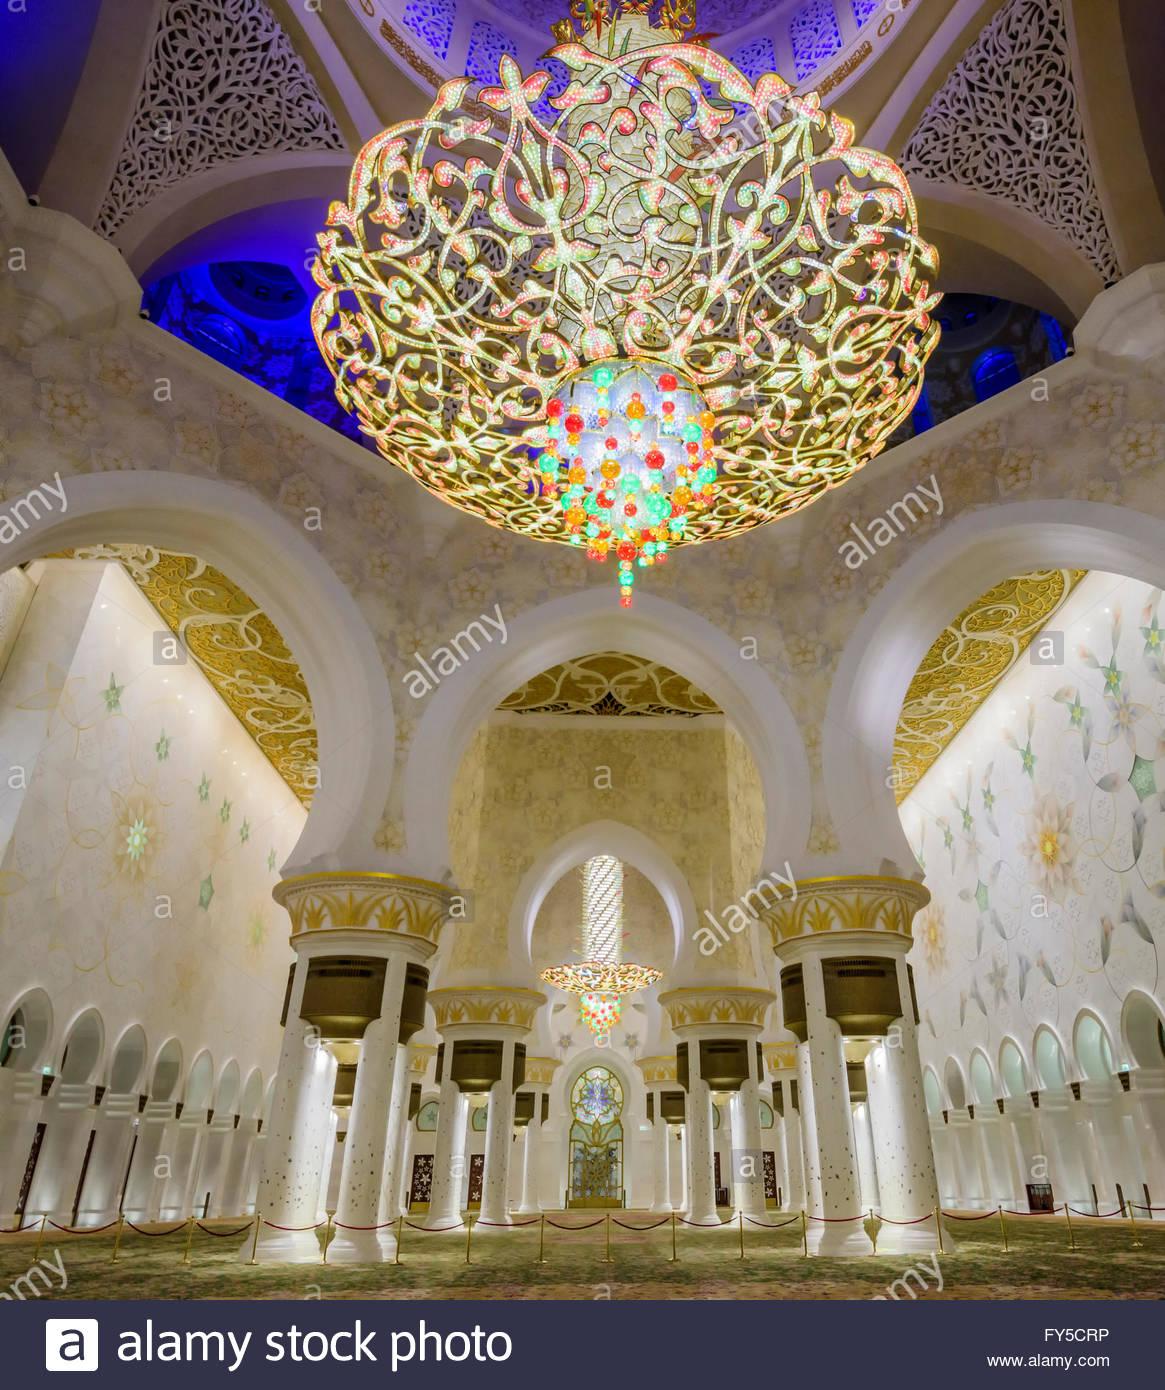 La principale salle de prière chandelier dans la grande mosquée Sheikh Zayed, Abu Dhabi Photo Stock